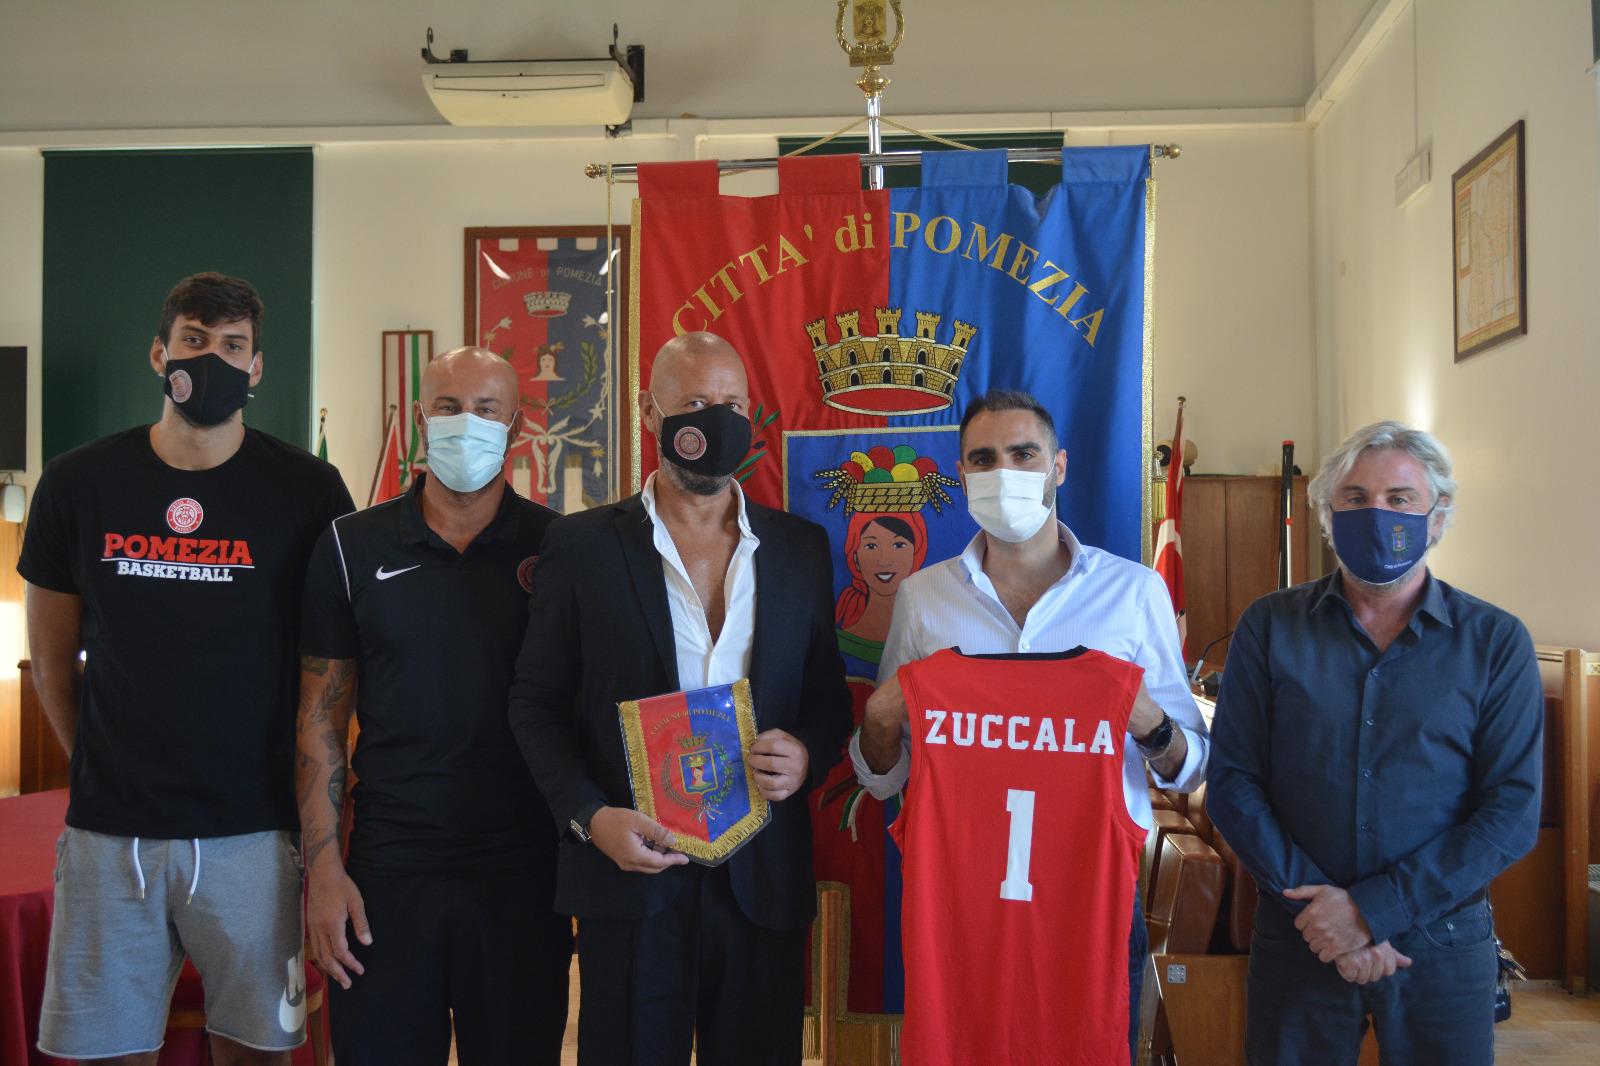 Pomezia, il Sindaco riceve la Virtus Pomezia Basket